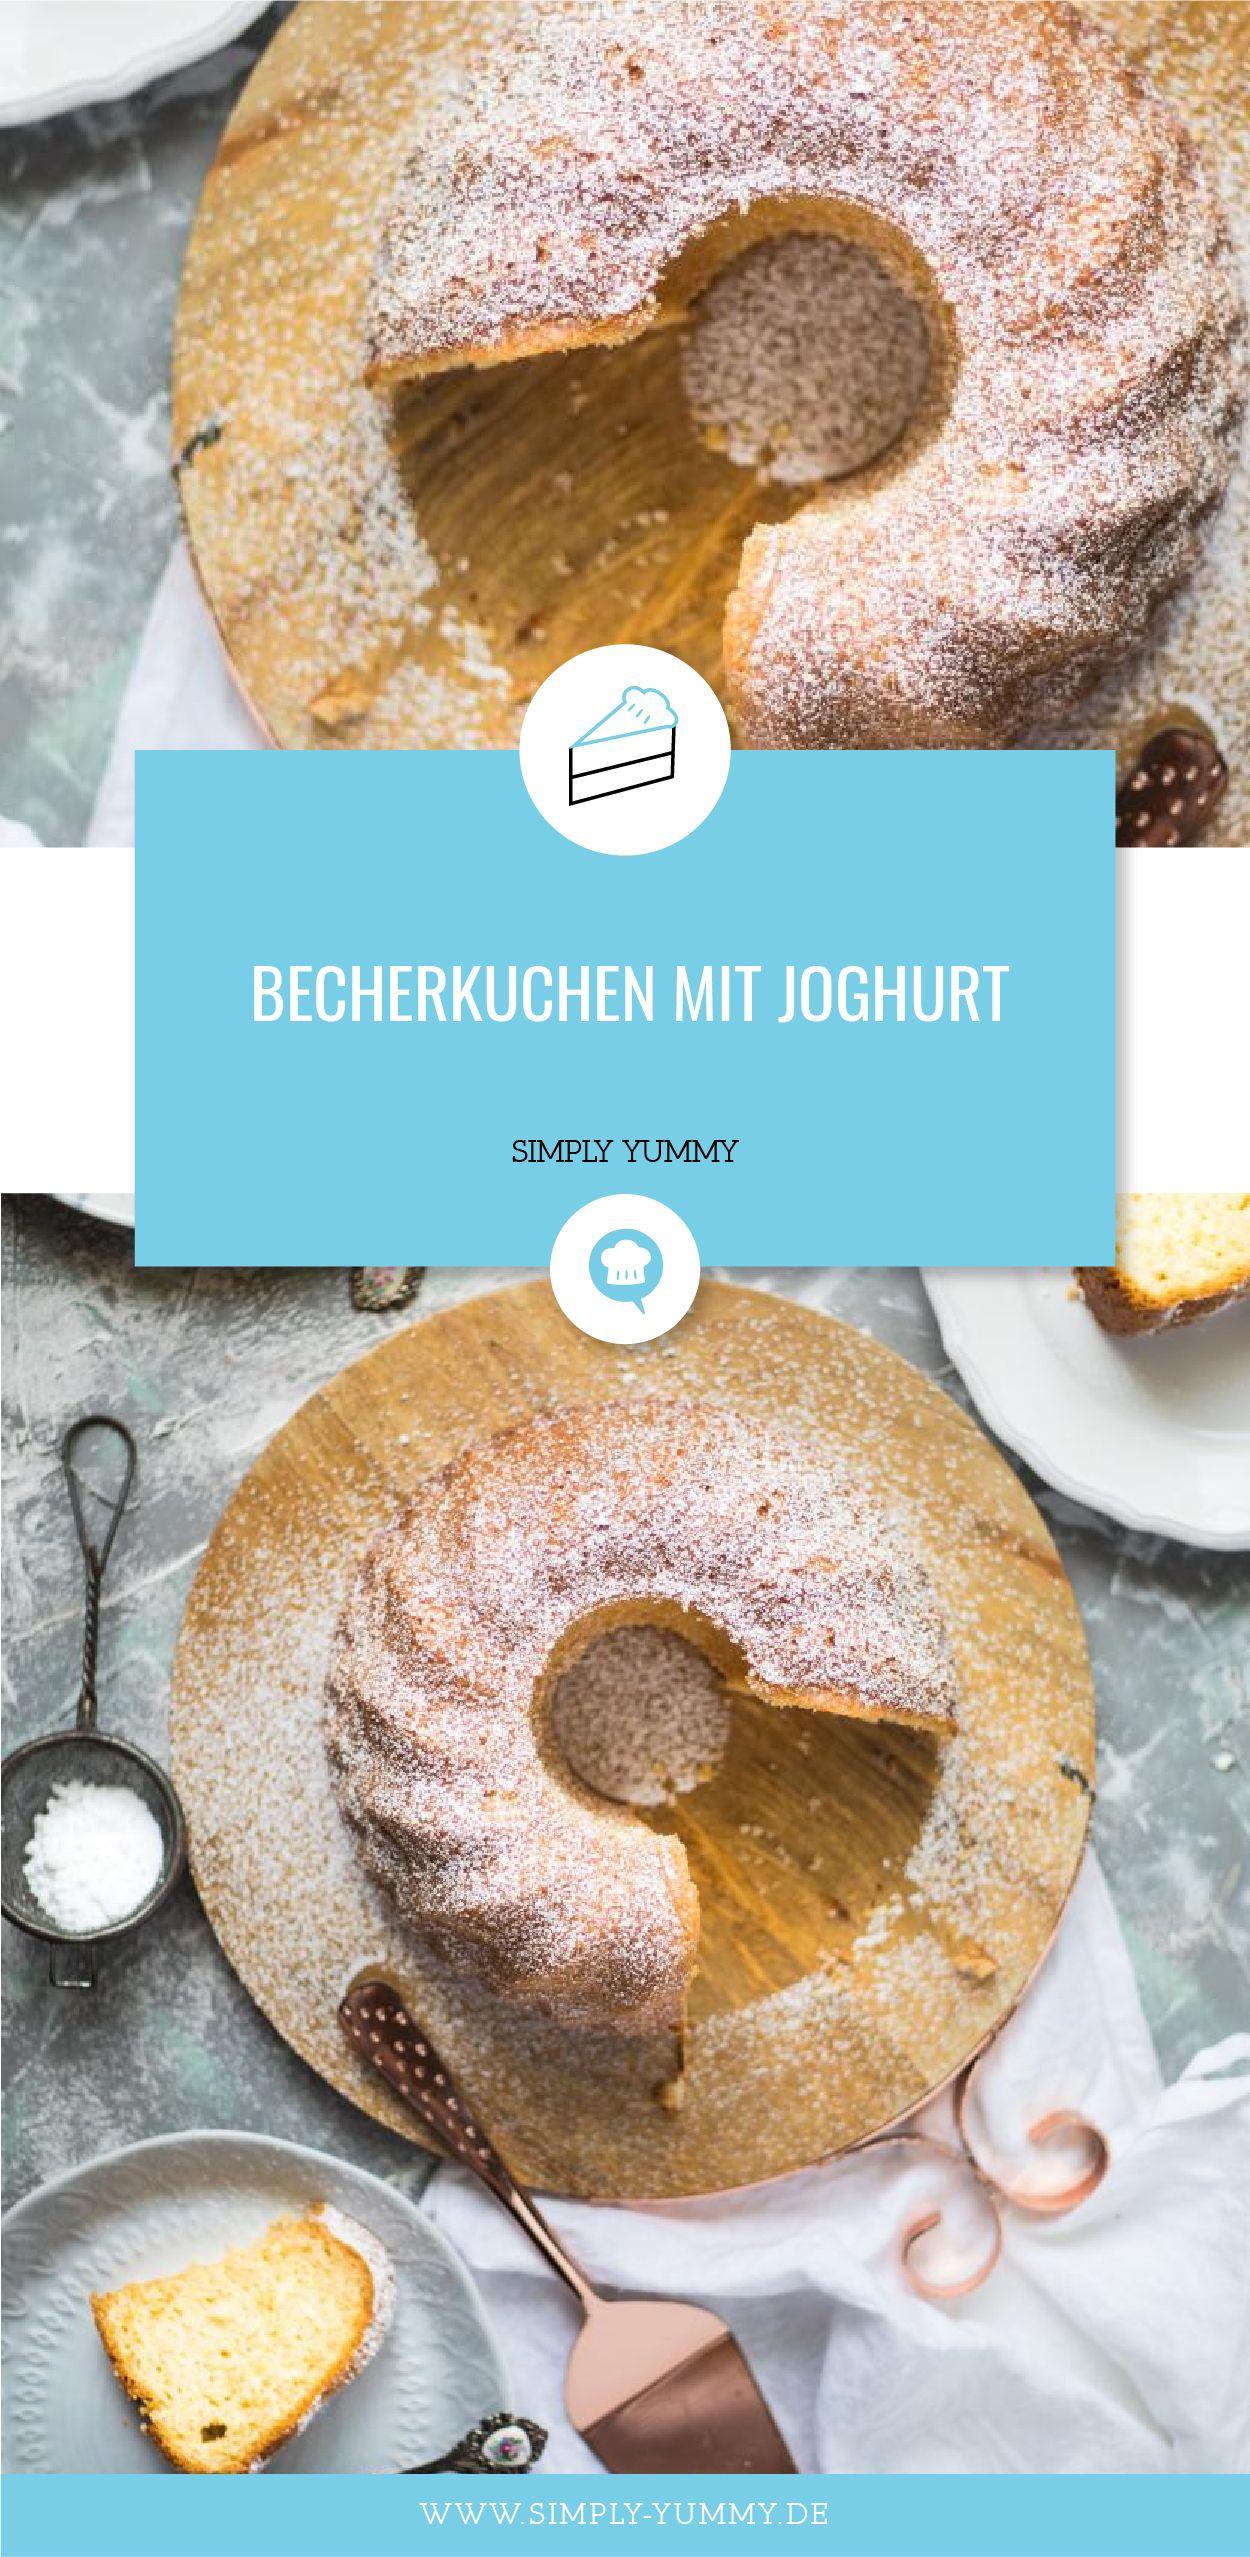 Becherkuchen mit Joghurt / extra saftig #becherkuchen #joghurt #kuchen #rezept #rezepte #backen #lecker #saftig #gugelhupf #einfach #schnell #anfängertauglich #recipeformarshmallows